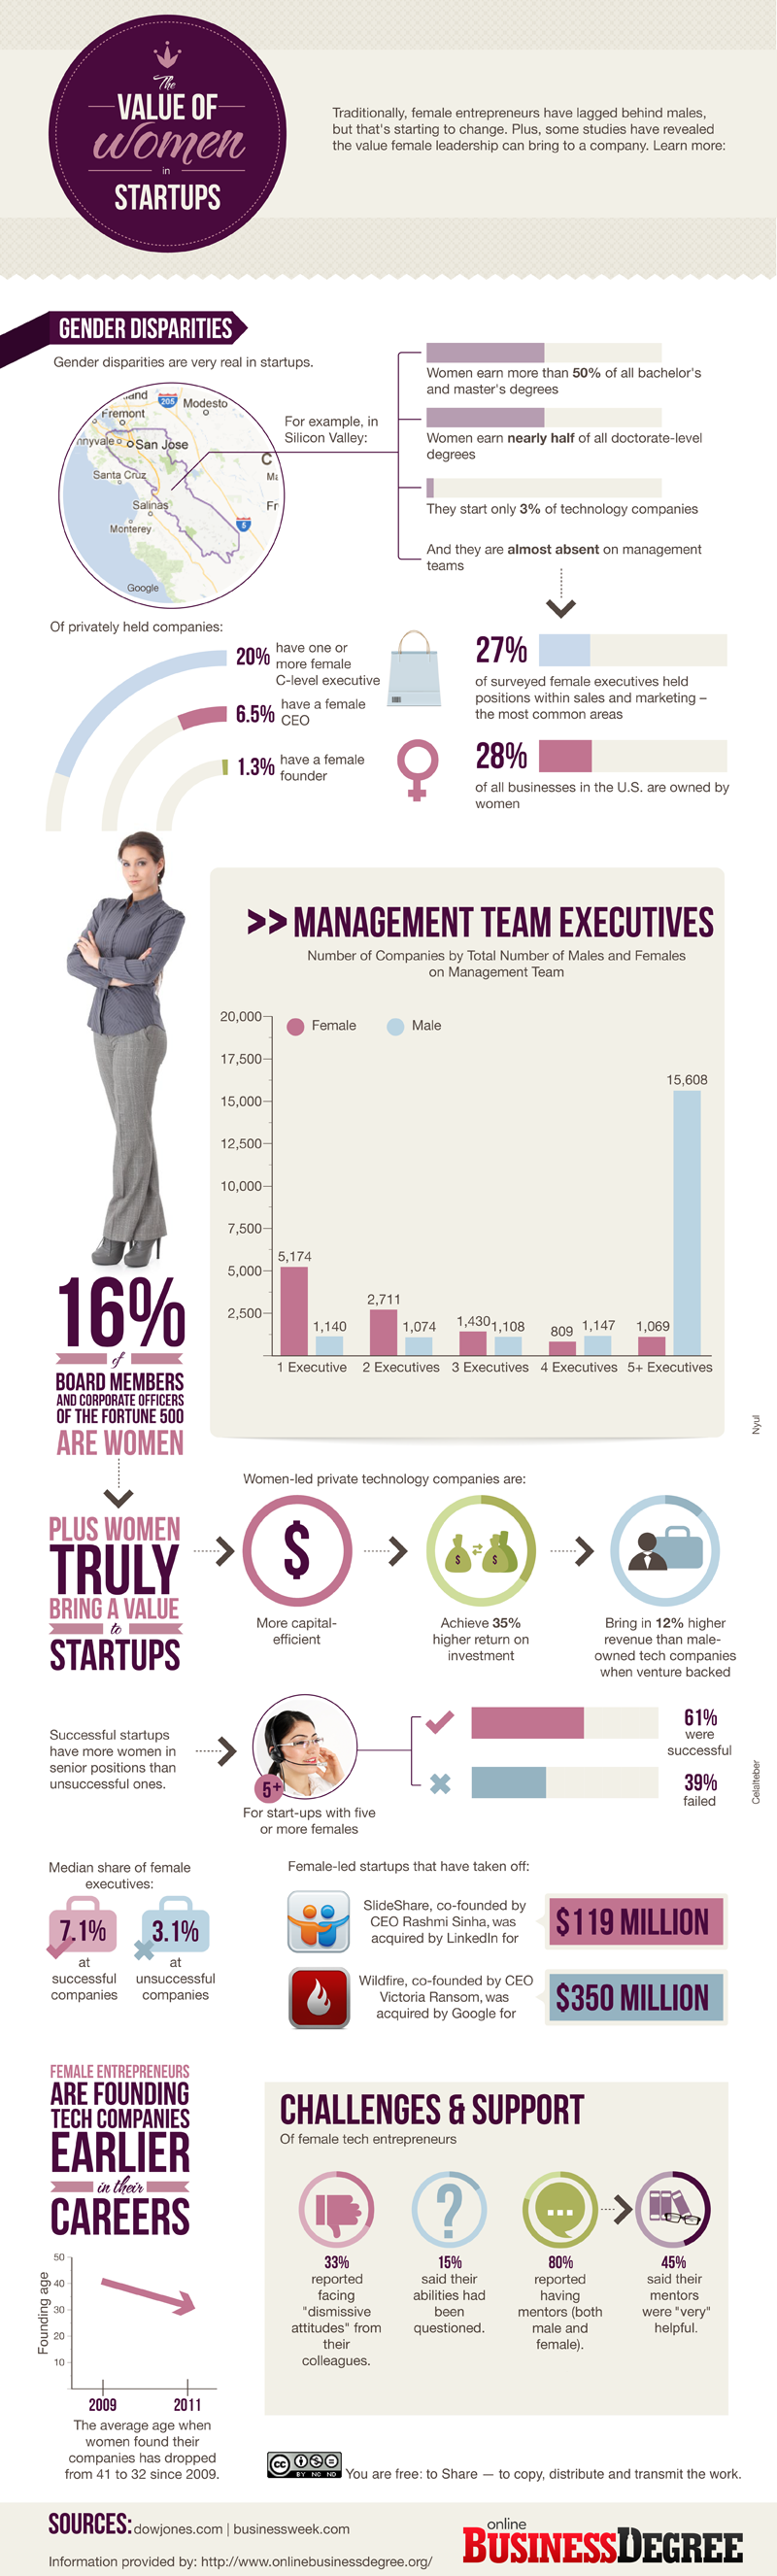 the value of women in startups women in business entrepreneurs women in startups